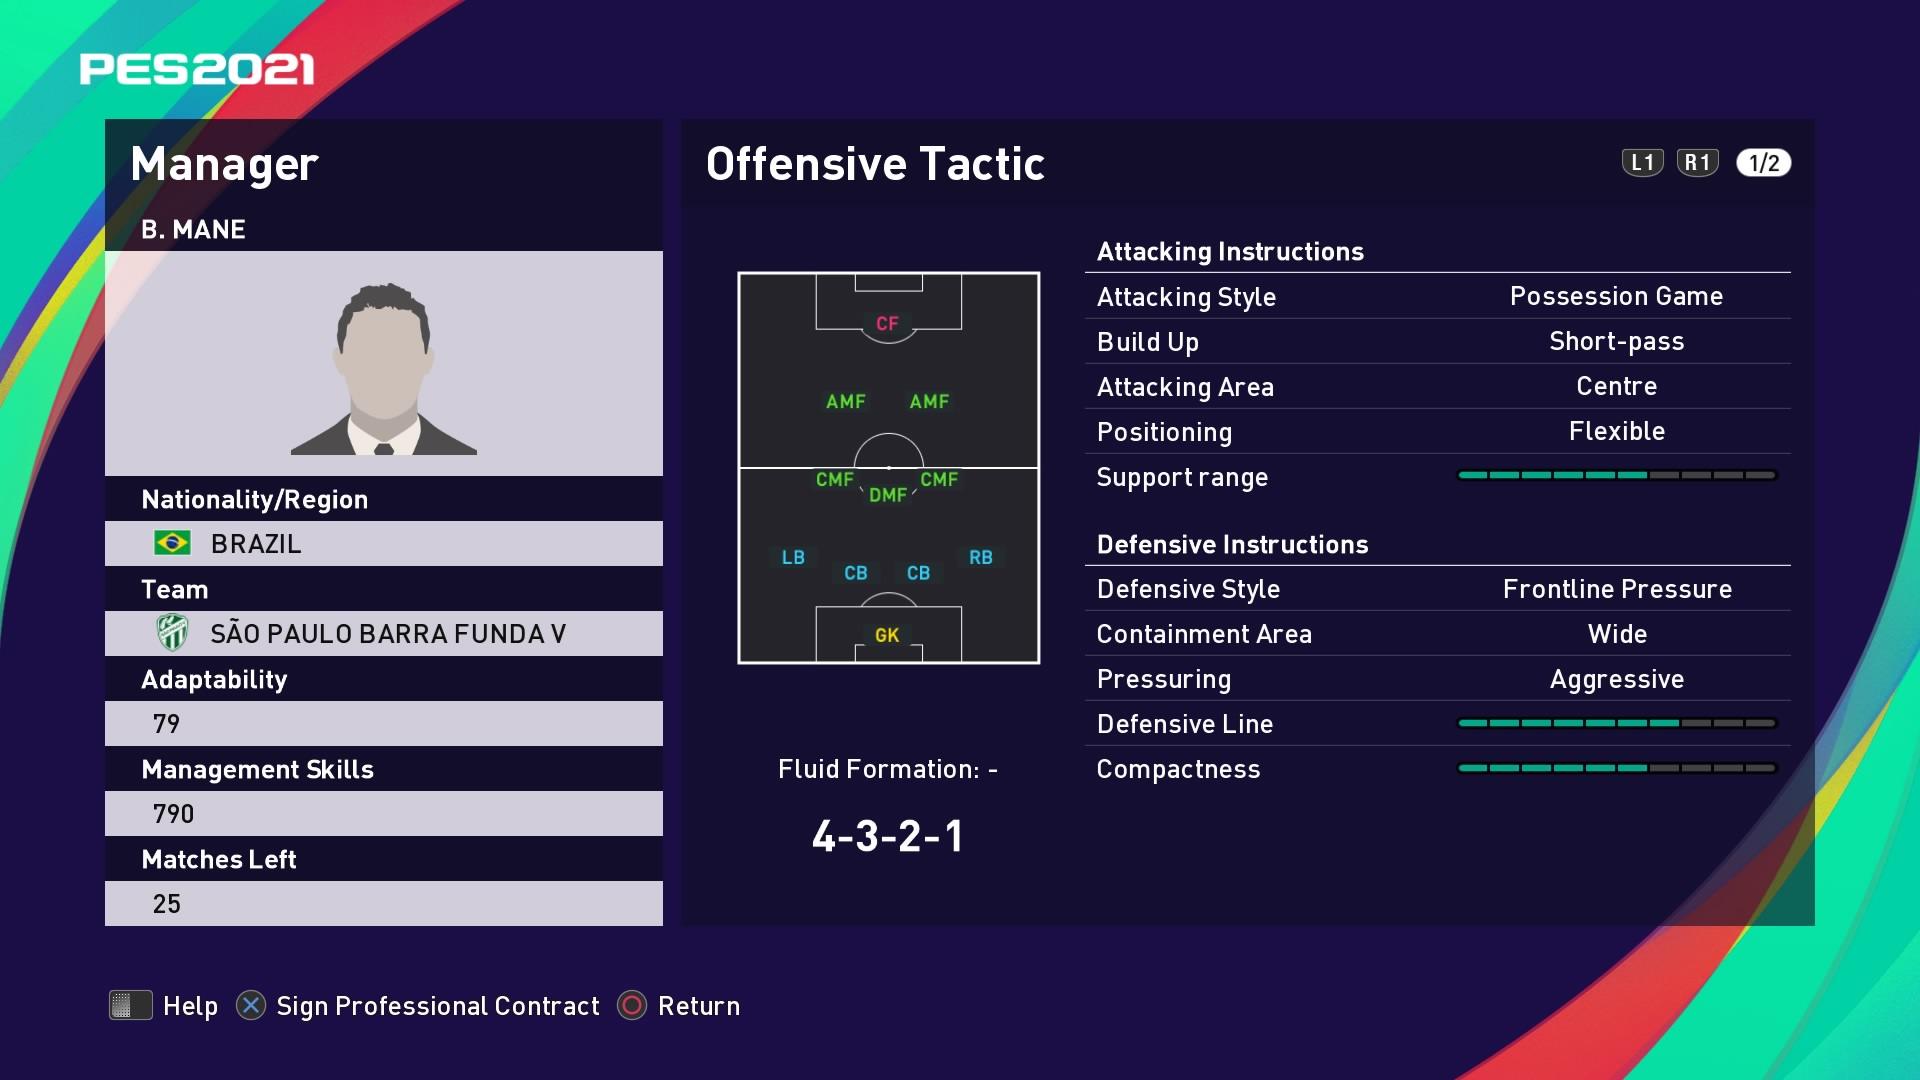 B. Mane (Vanderlei Luxemburgo) Offensive Tactic in PES 2021 myClub